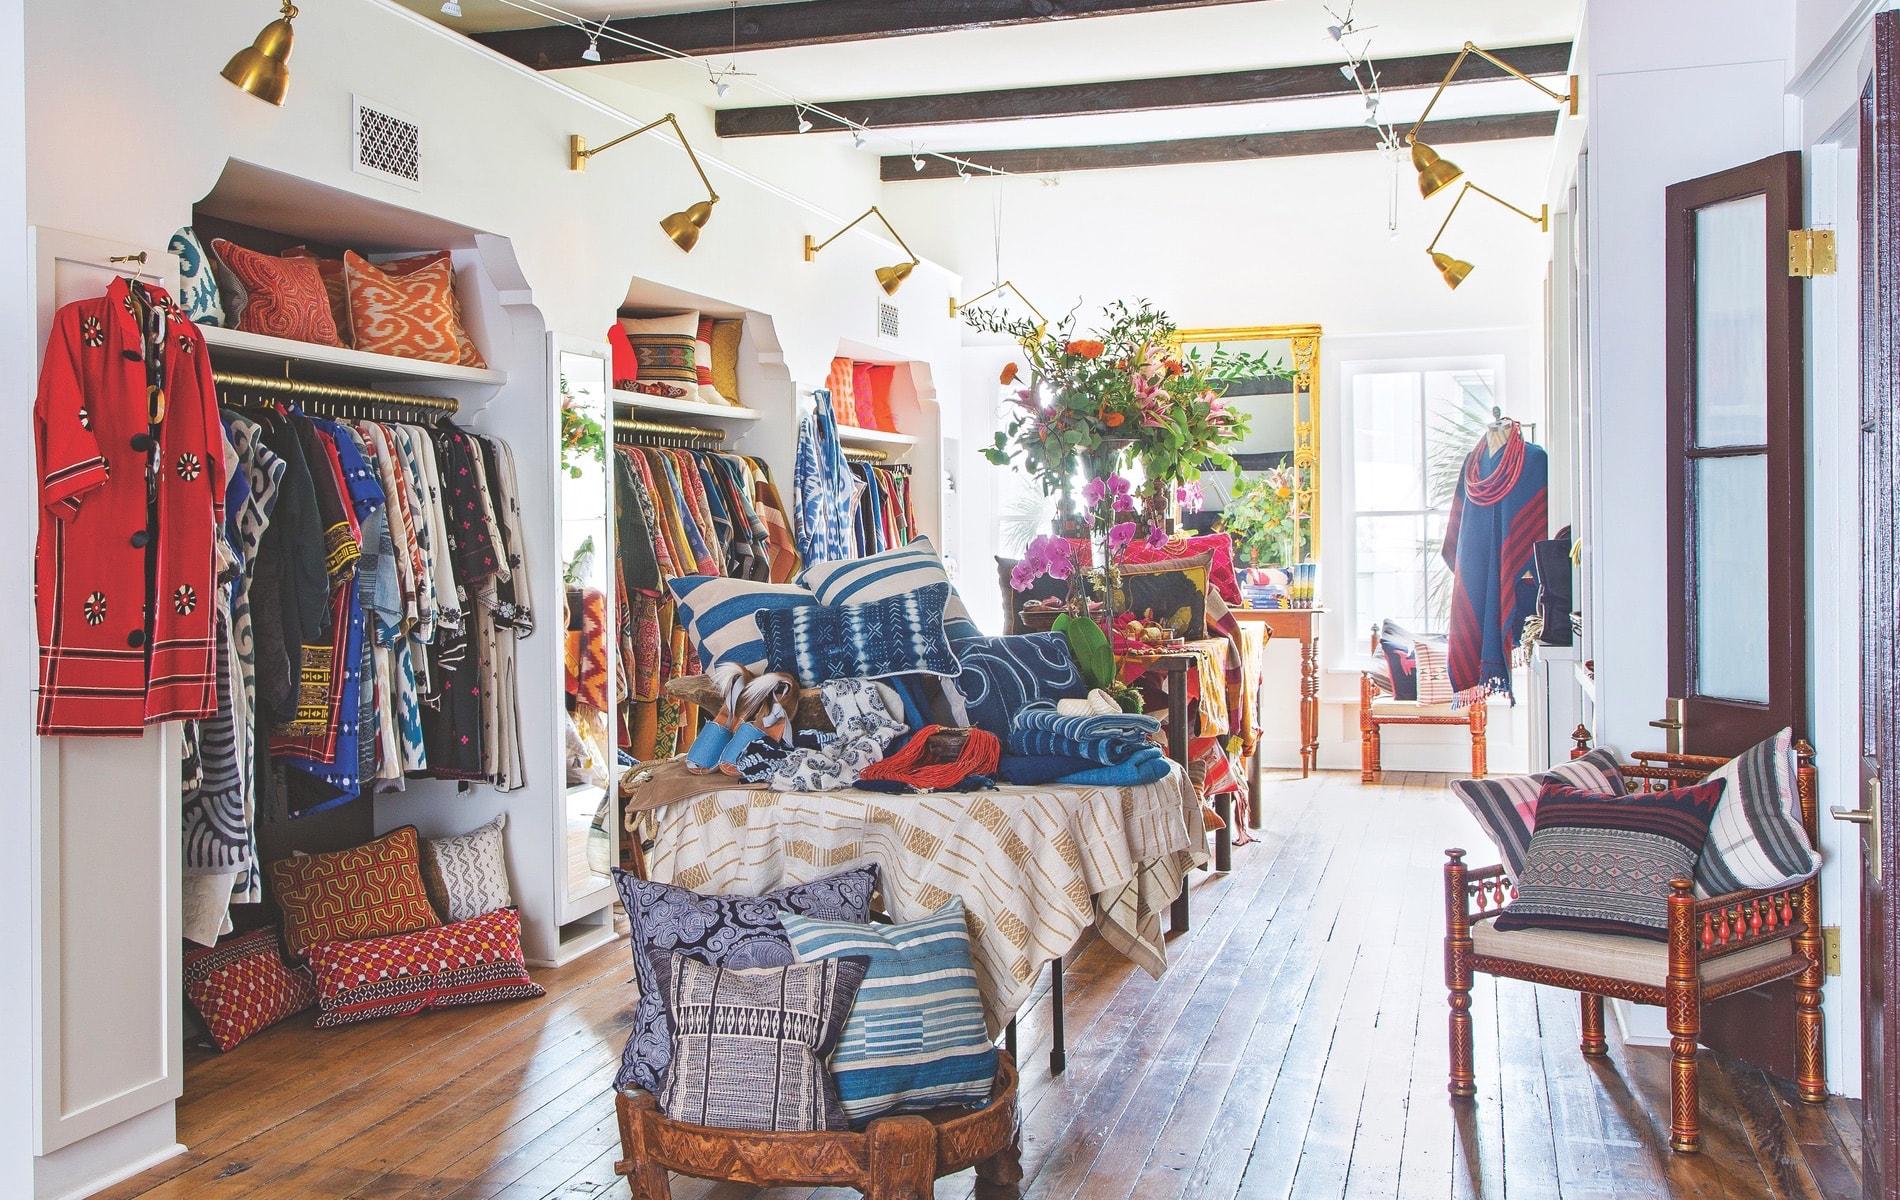 The Ibu Movement flagship store on Charleston's King Street